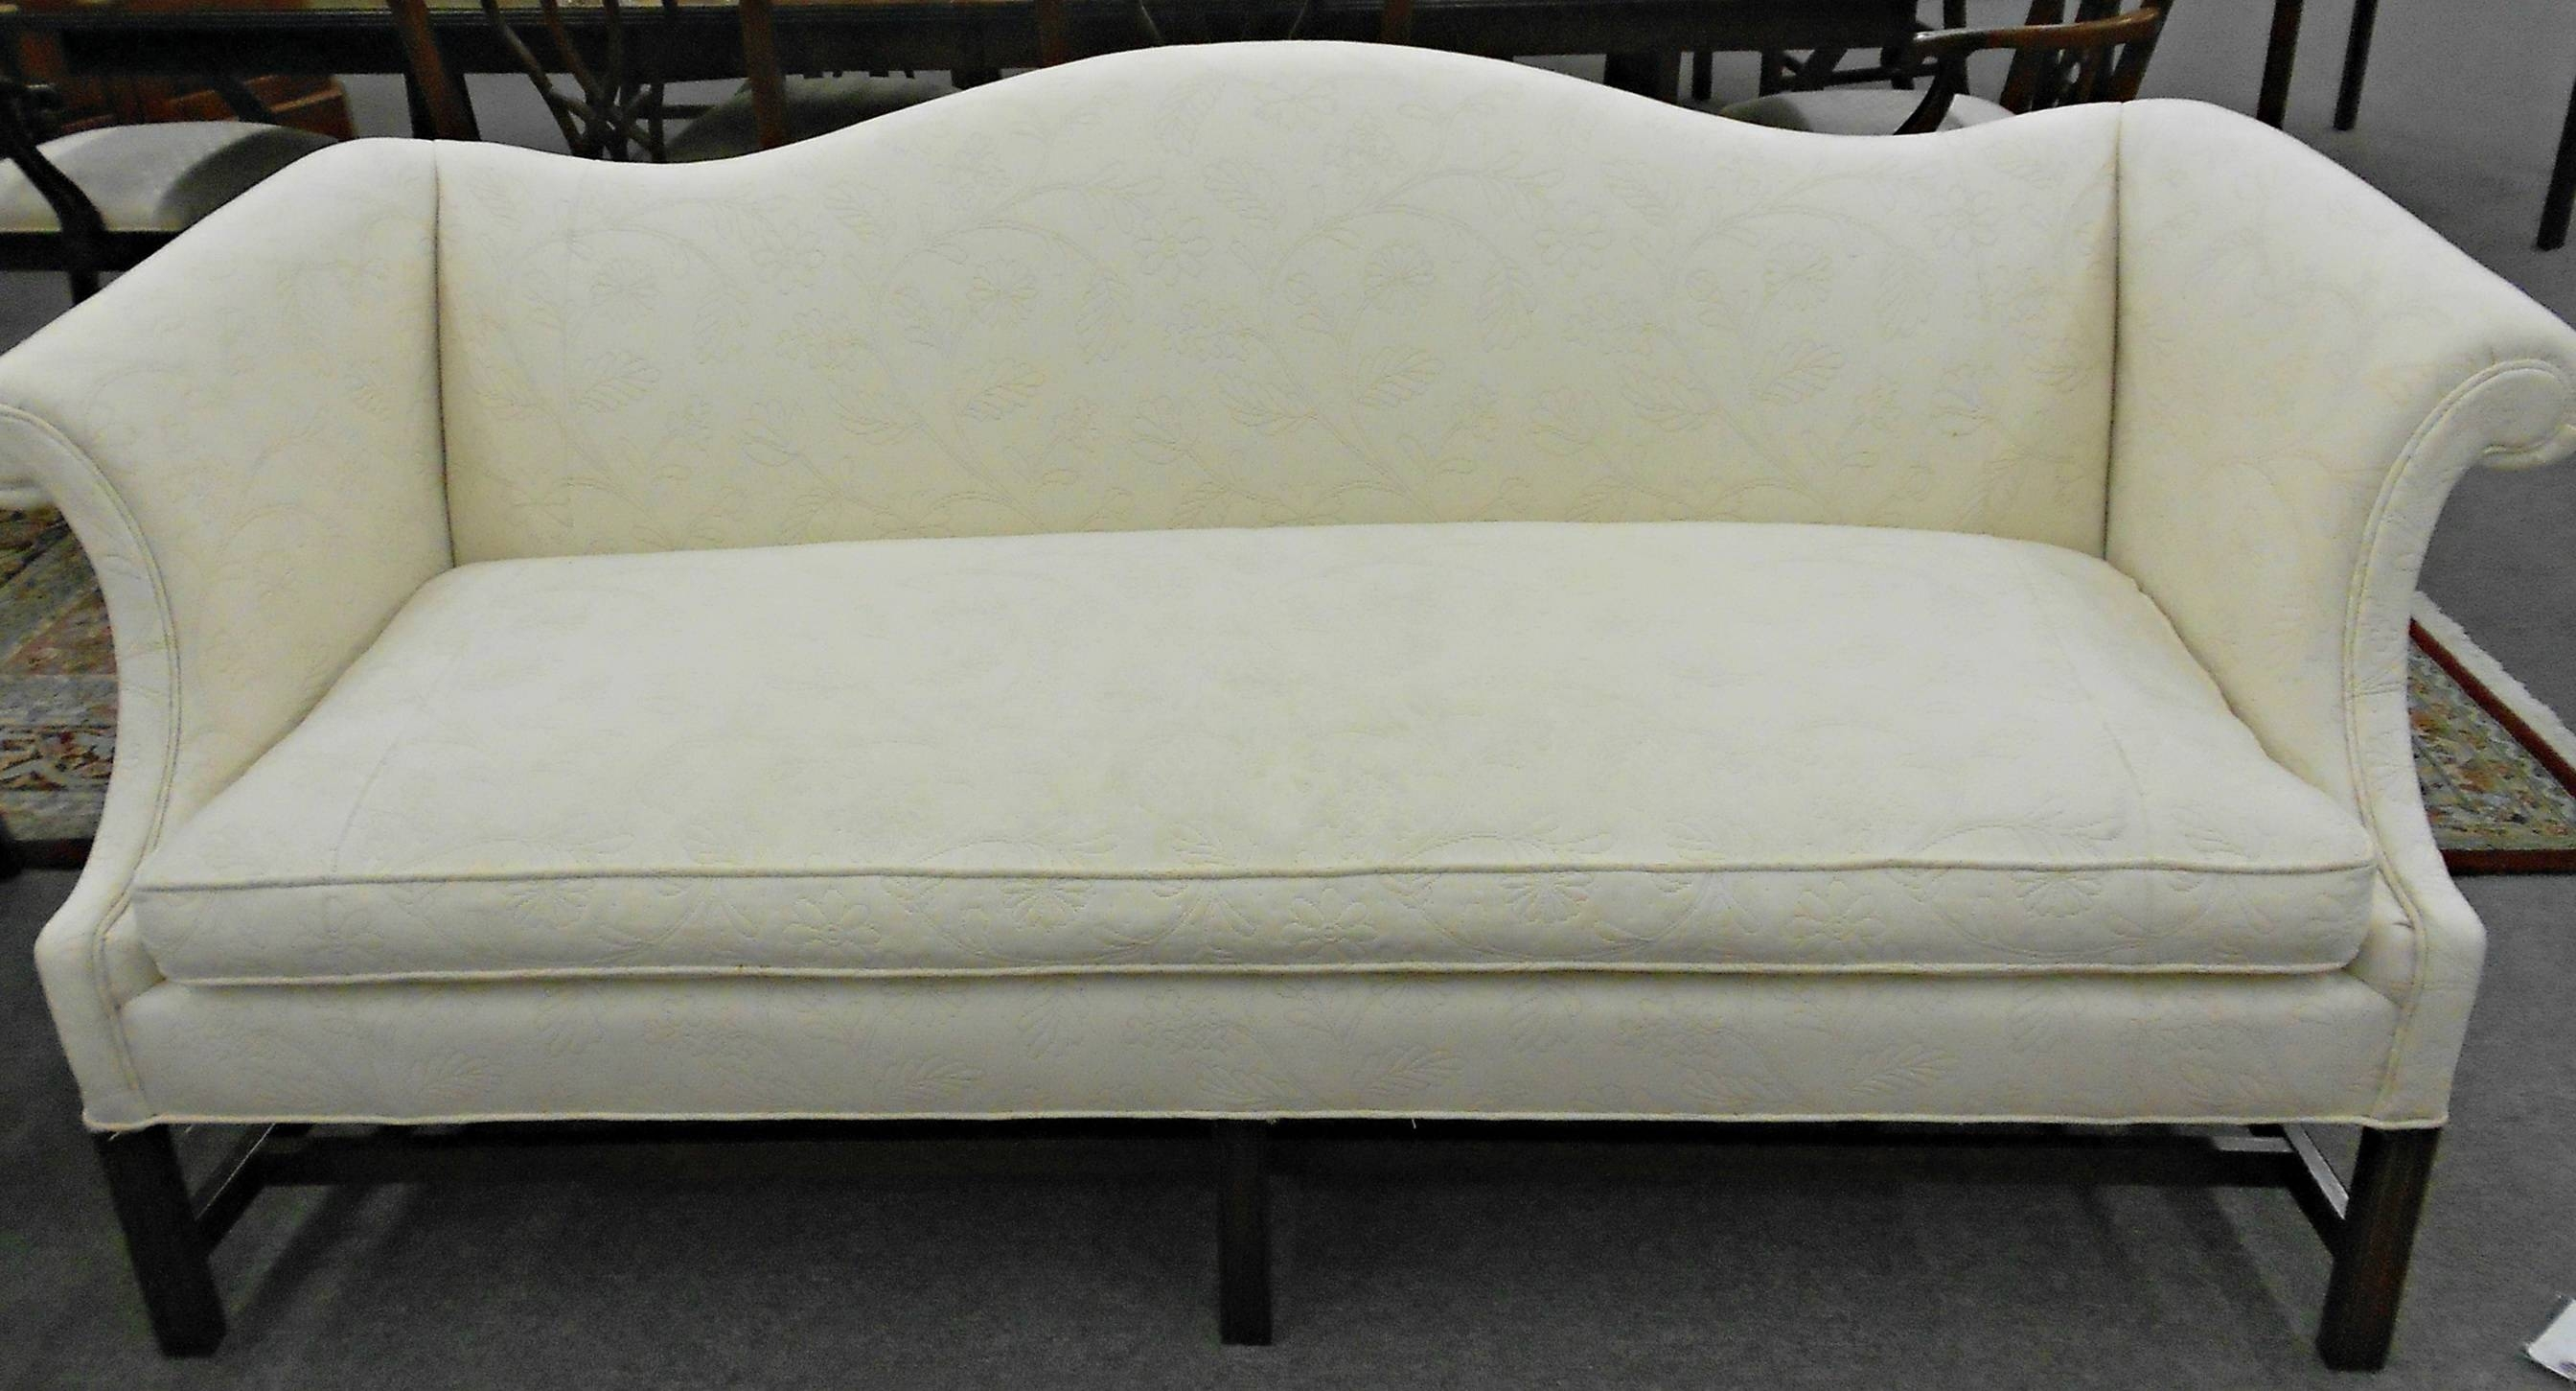 Sofas Center : Sofa White Camel Back Couch Beautiful Slipcover For inside Camelback Sofa Slipcovers (Image 14 of 15)